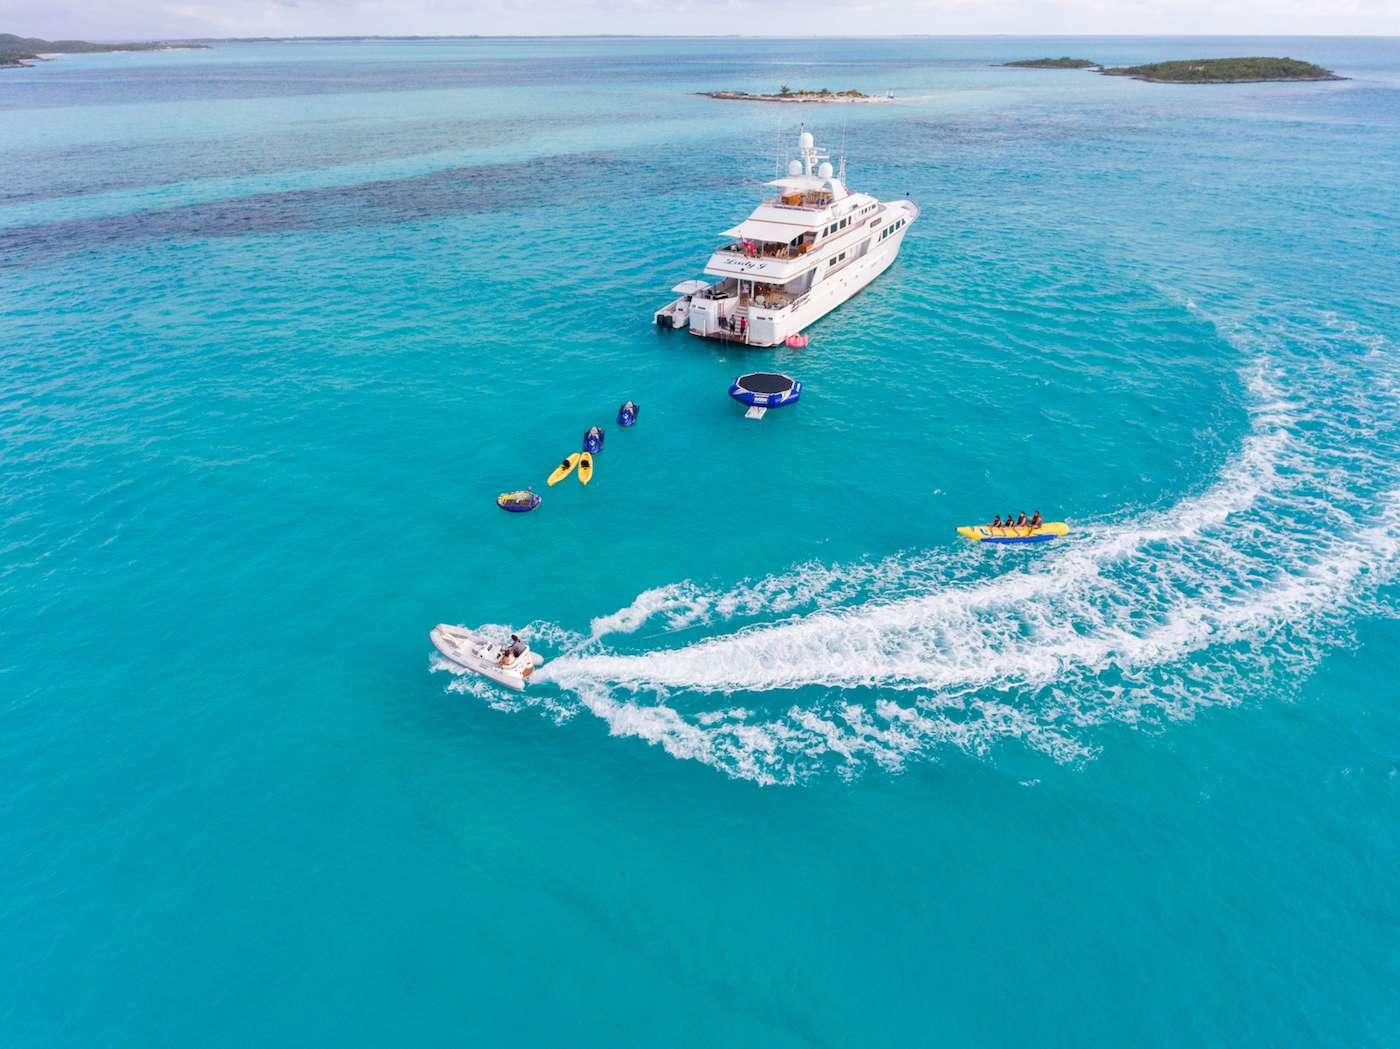 Motor Yacht 'LADY J', 12 PAX, 9 Crew, 142.00 Ft, 43.00 Meters, Built 1997, Palmer Johnson, Refit Year 2017